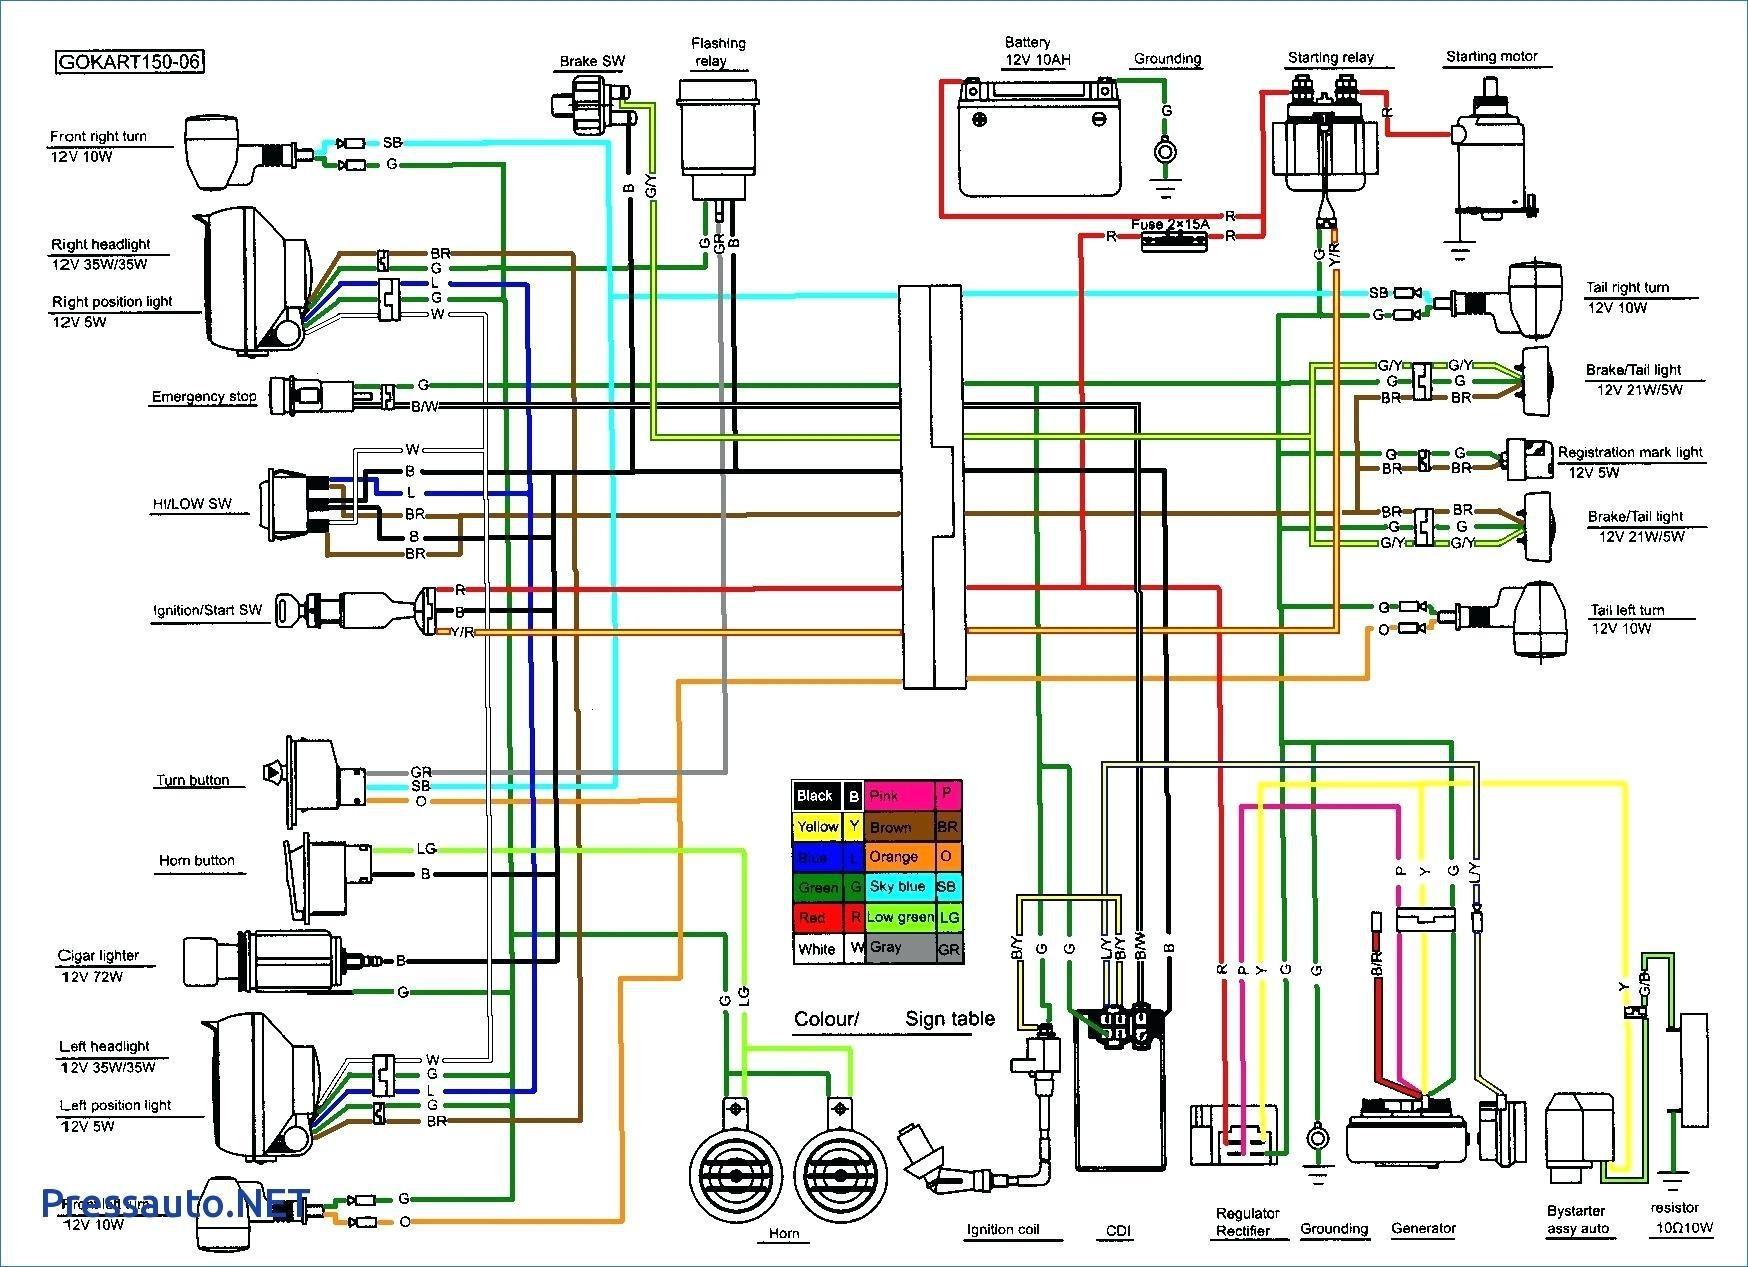 lt155 wiring diagram 1994 gmc sierra 1500 john deere schematic free